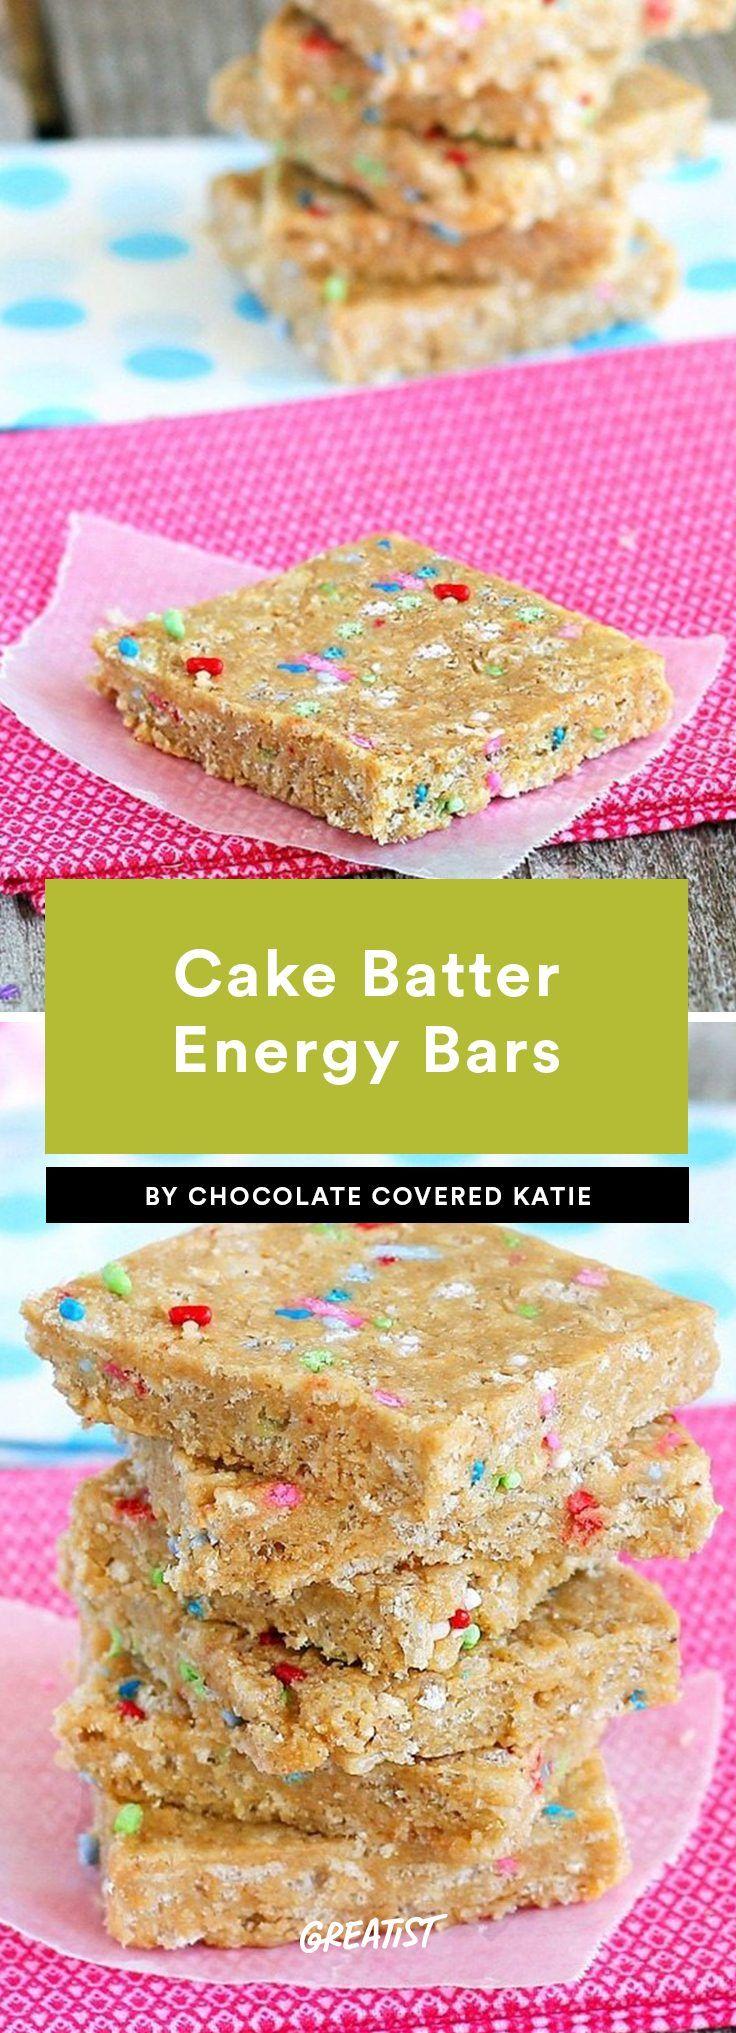 cake batter flavored protein powder